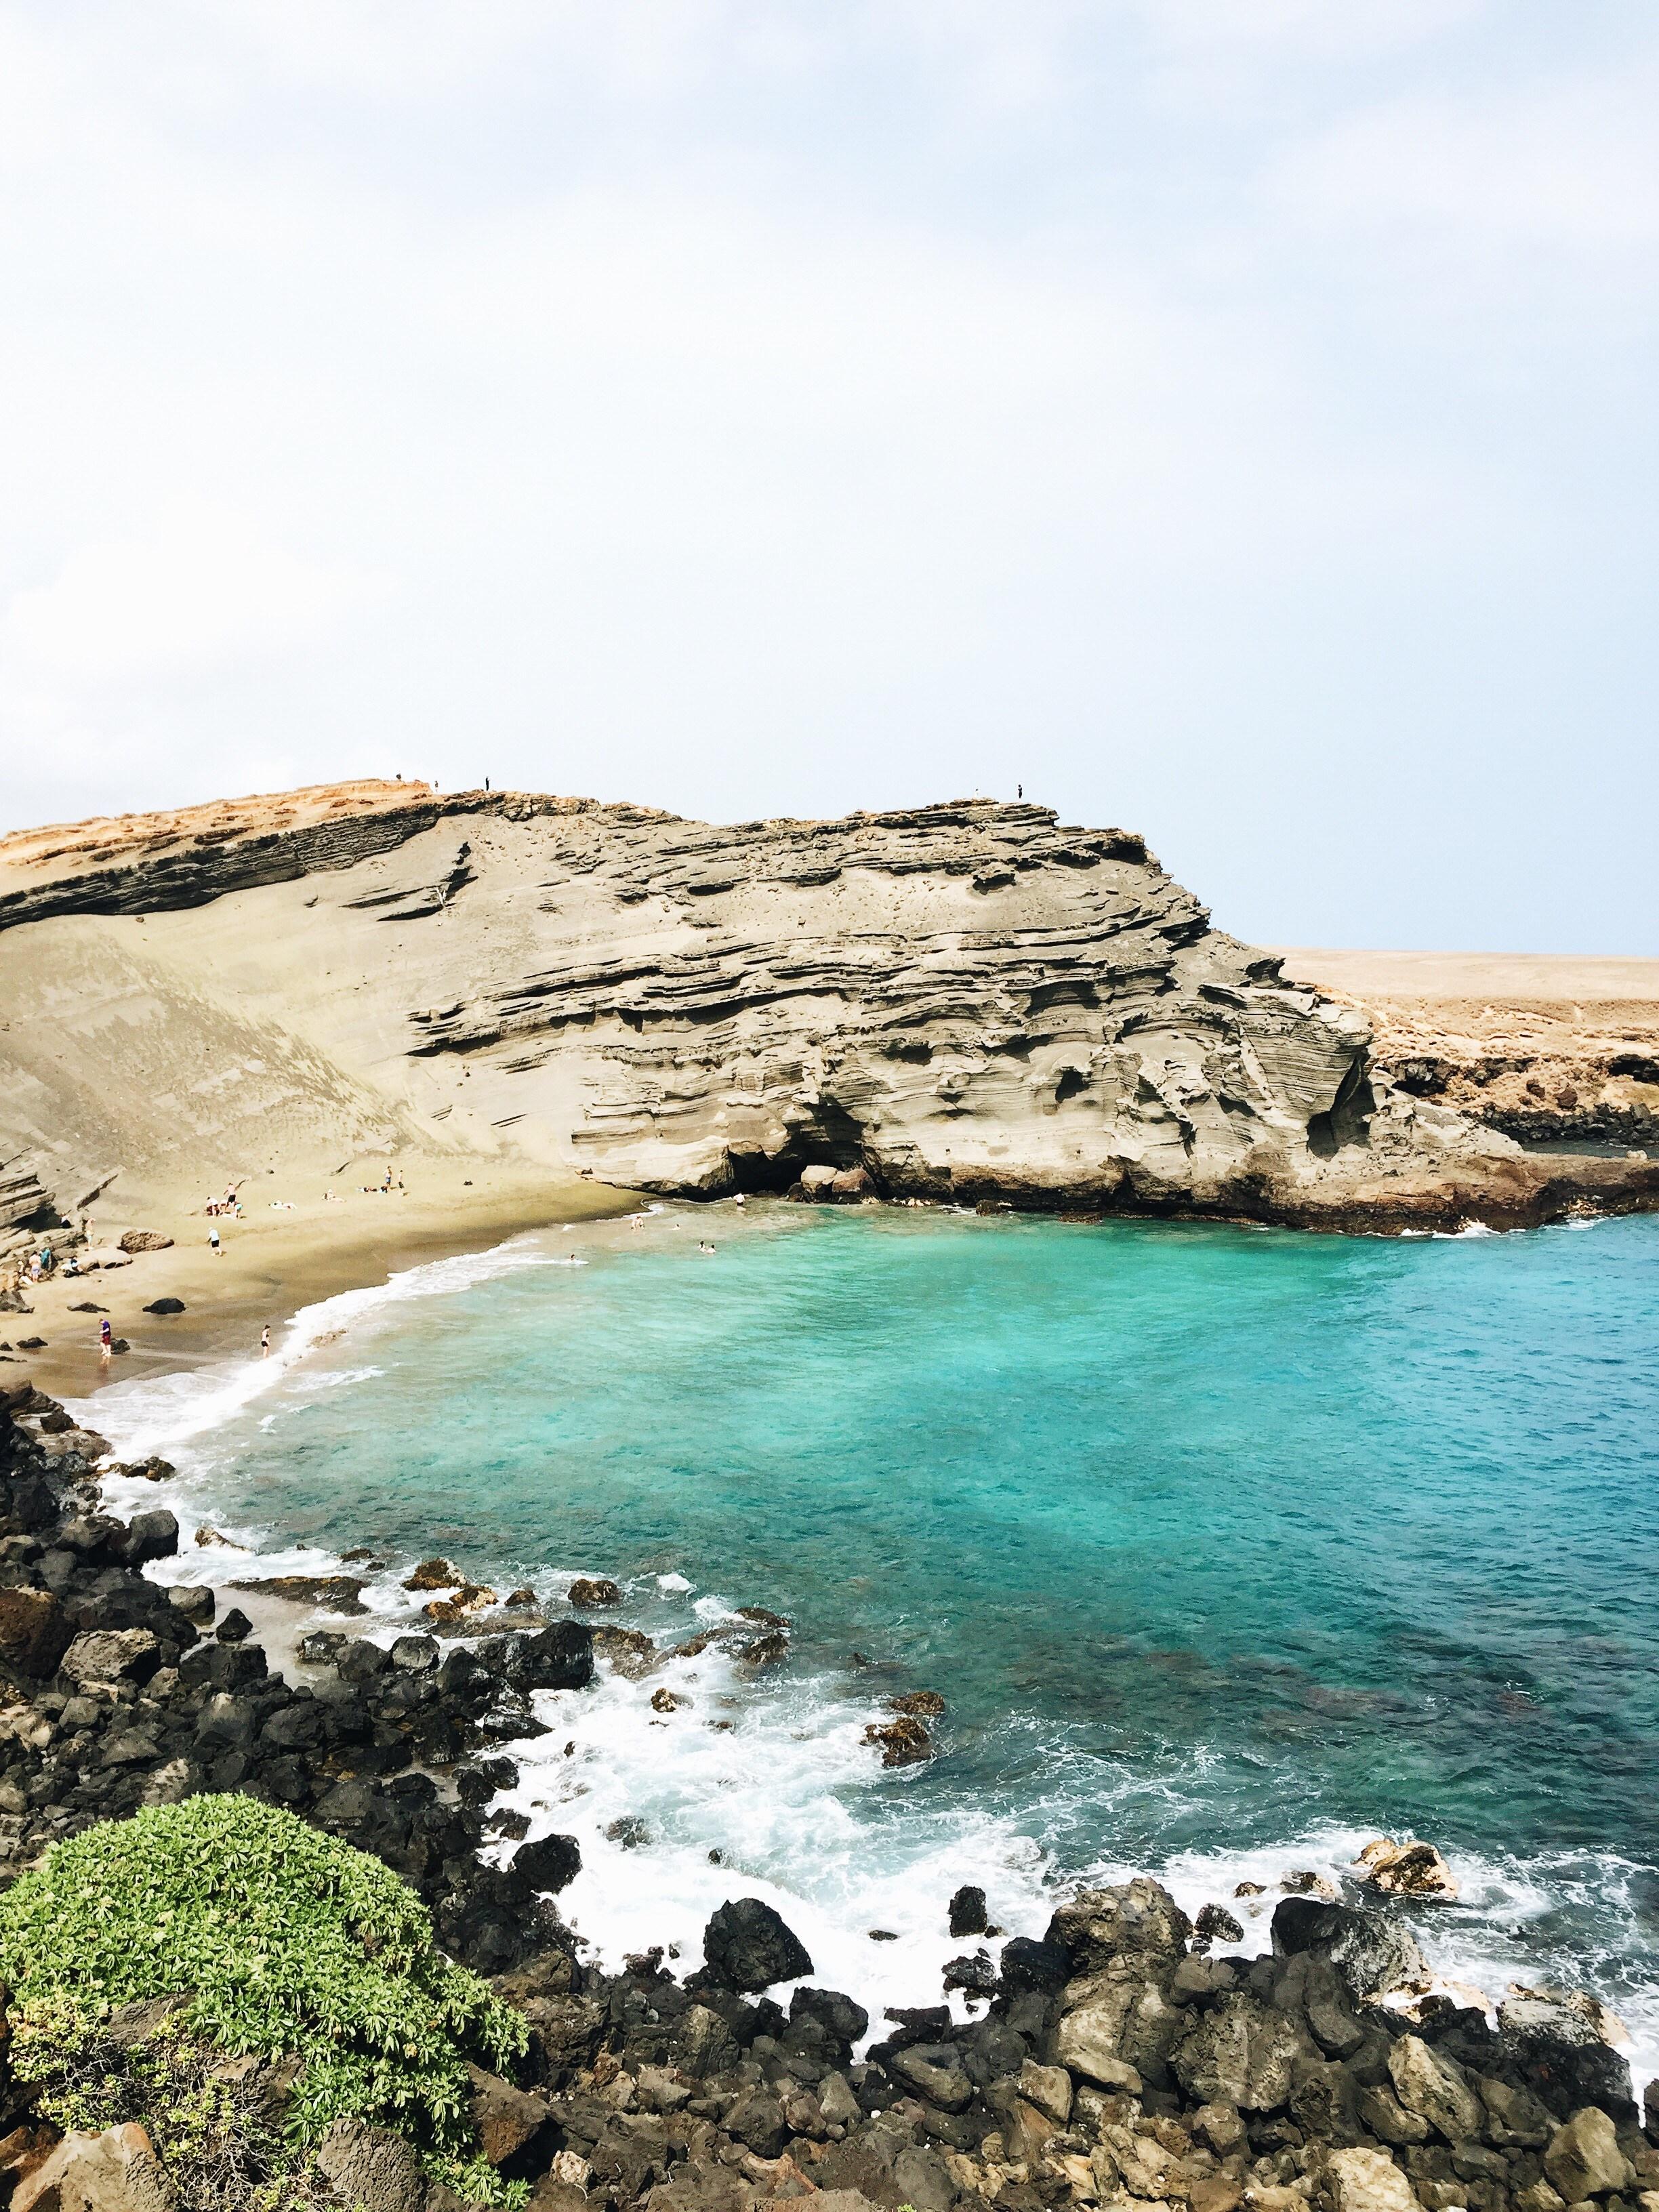 Elanaloo Travel Blogger - Green Sand Beach